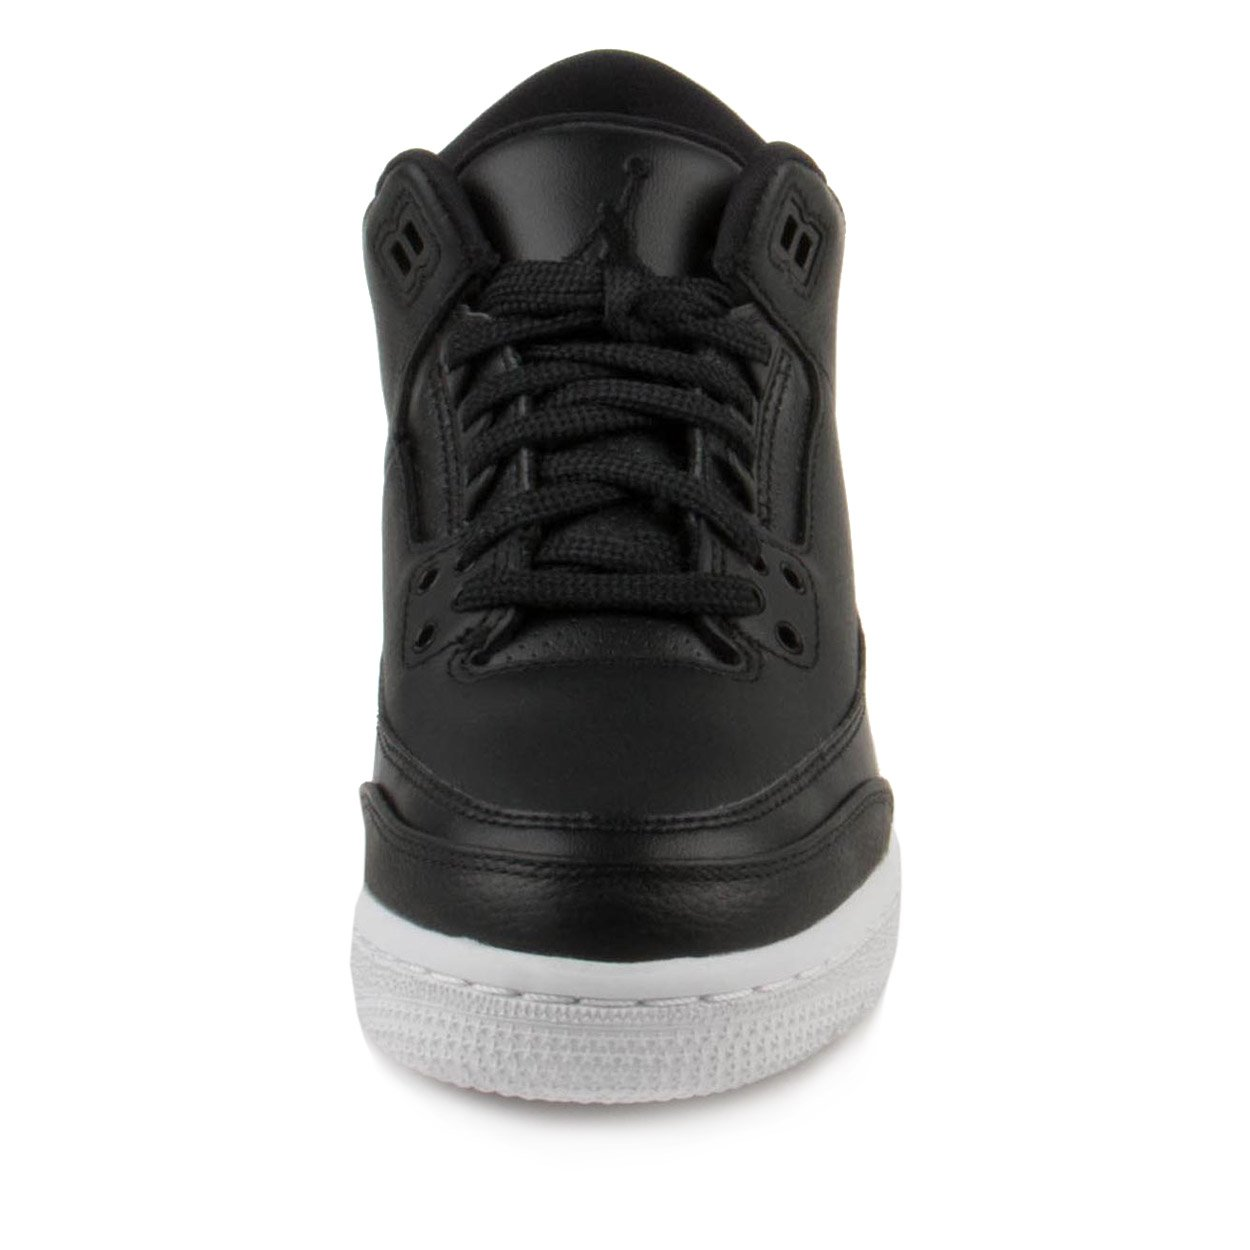 NIKE Jordan Air 3 Retro Bg Boys Basketball Shoes (7Y, Black/Black/White) by Jordan (Image #3)